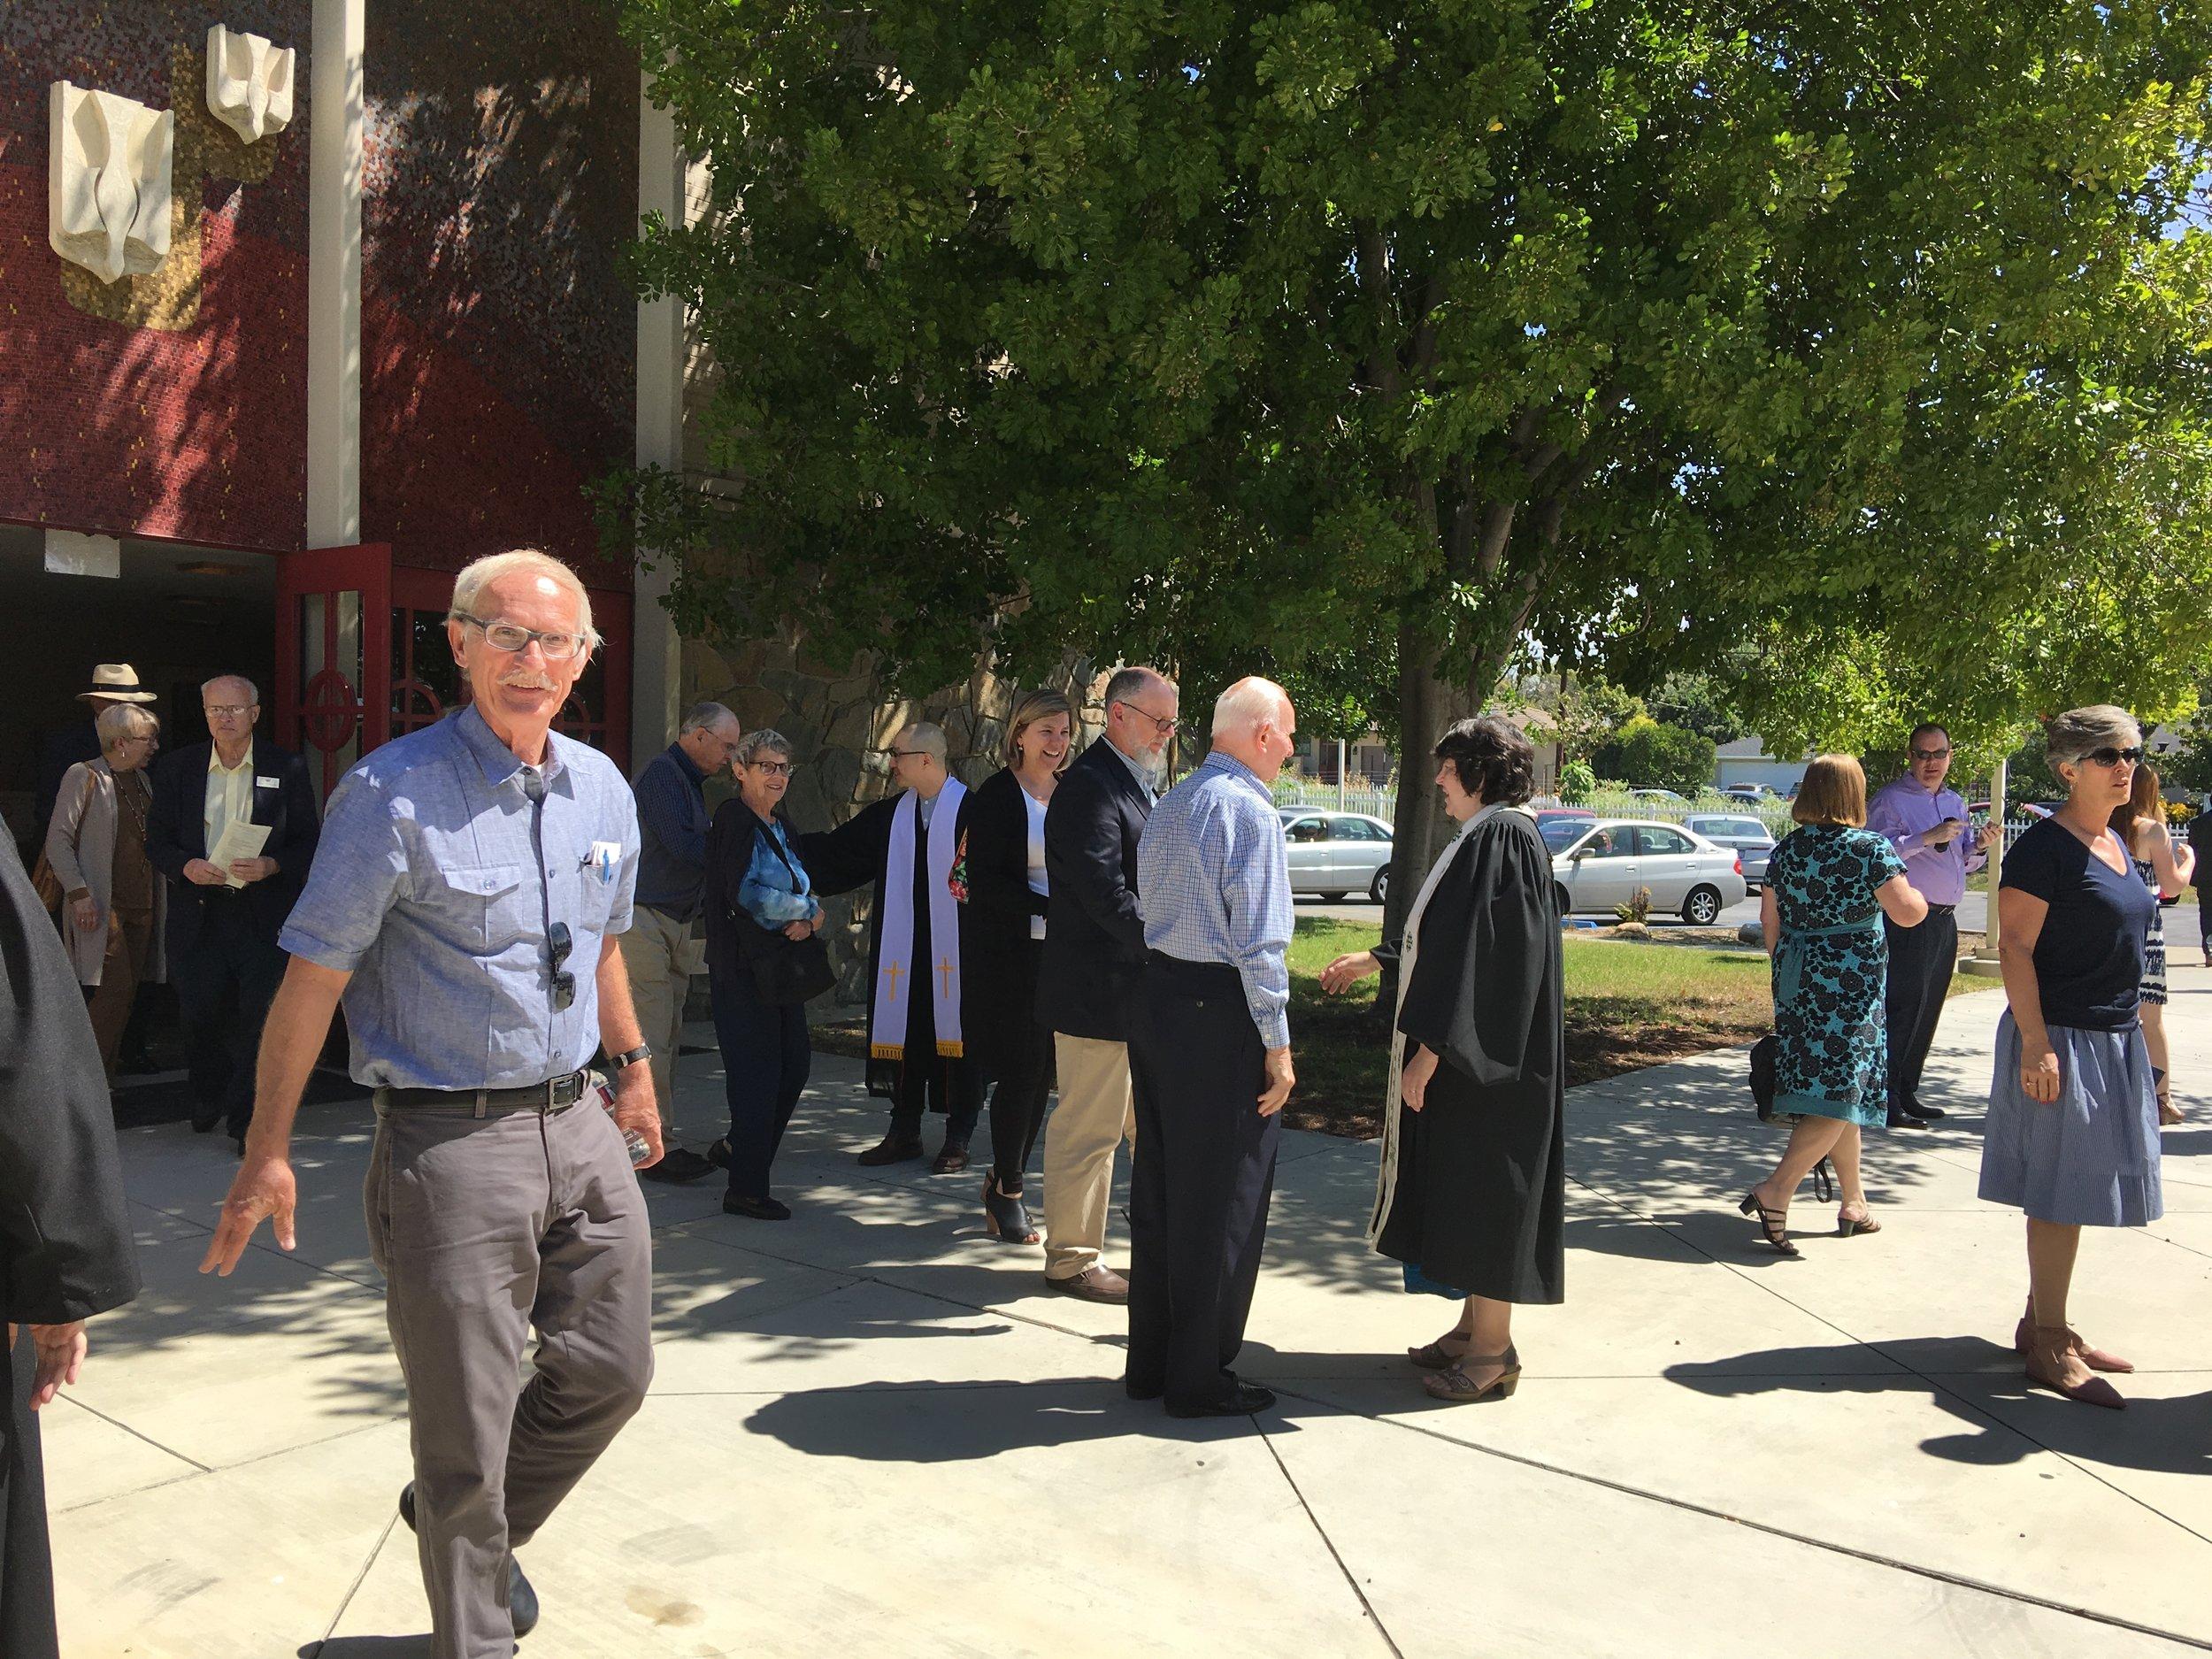 claremont-presbyterian-church-life-17.JPG